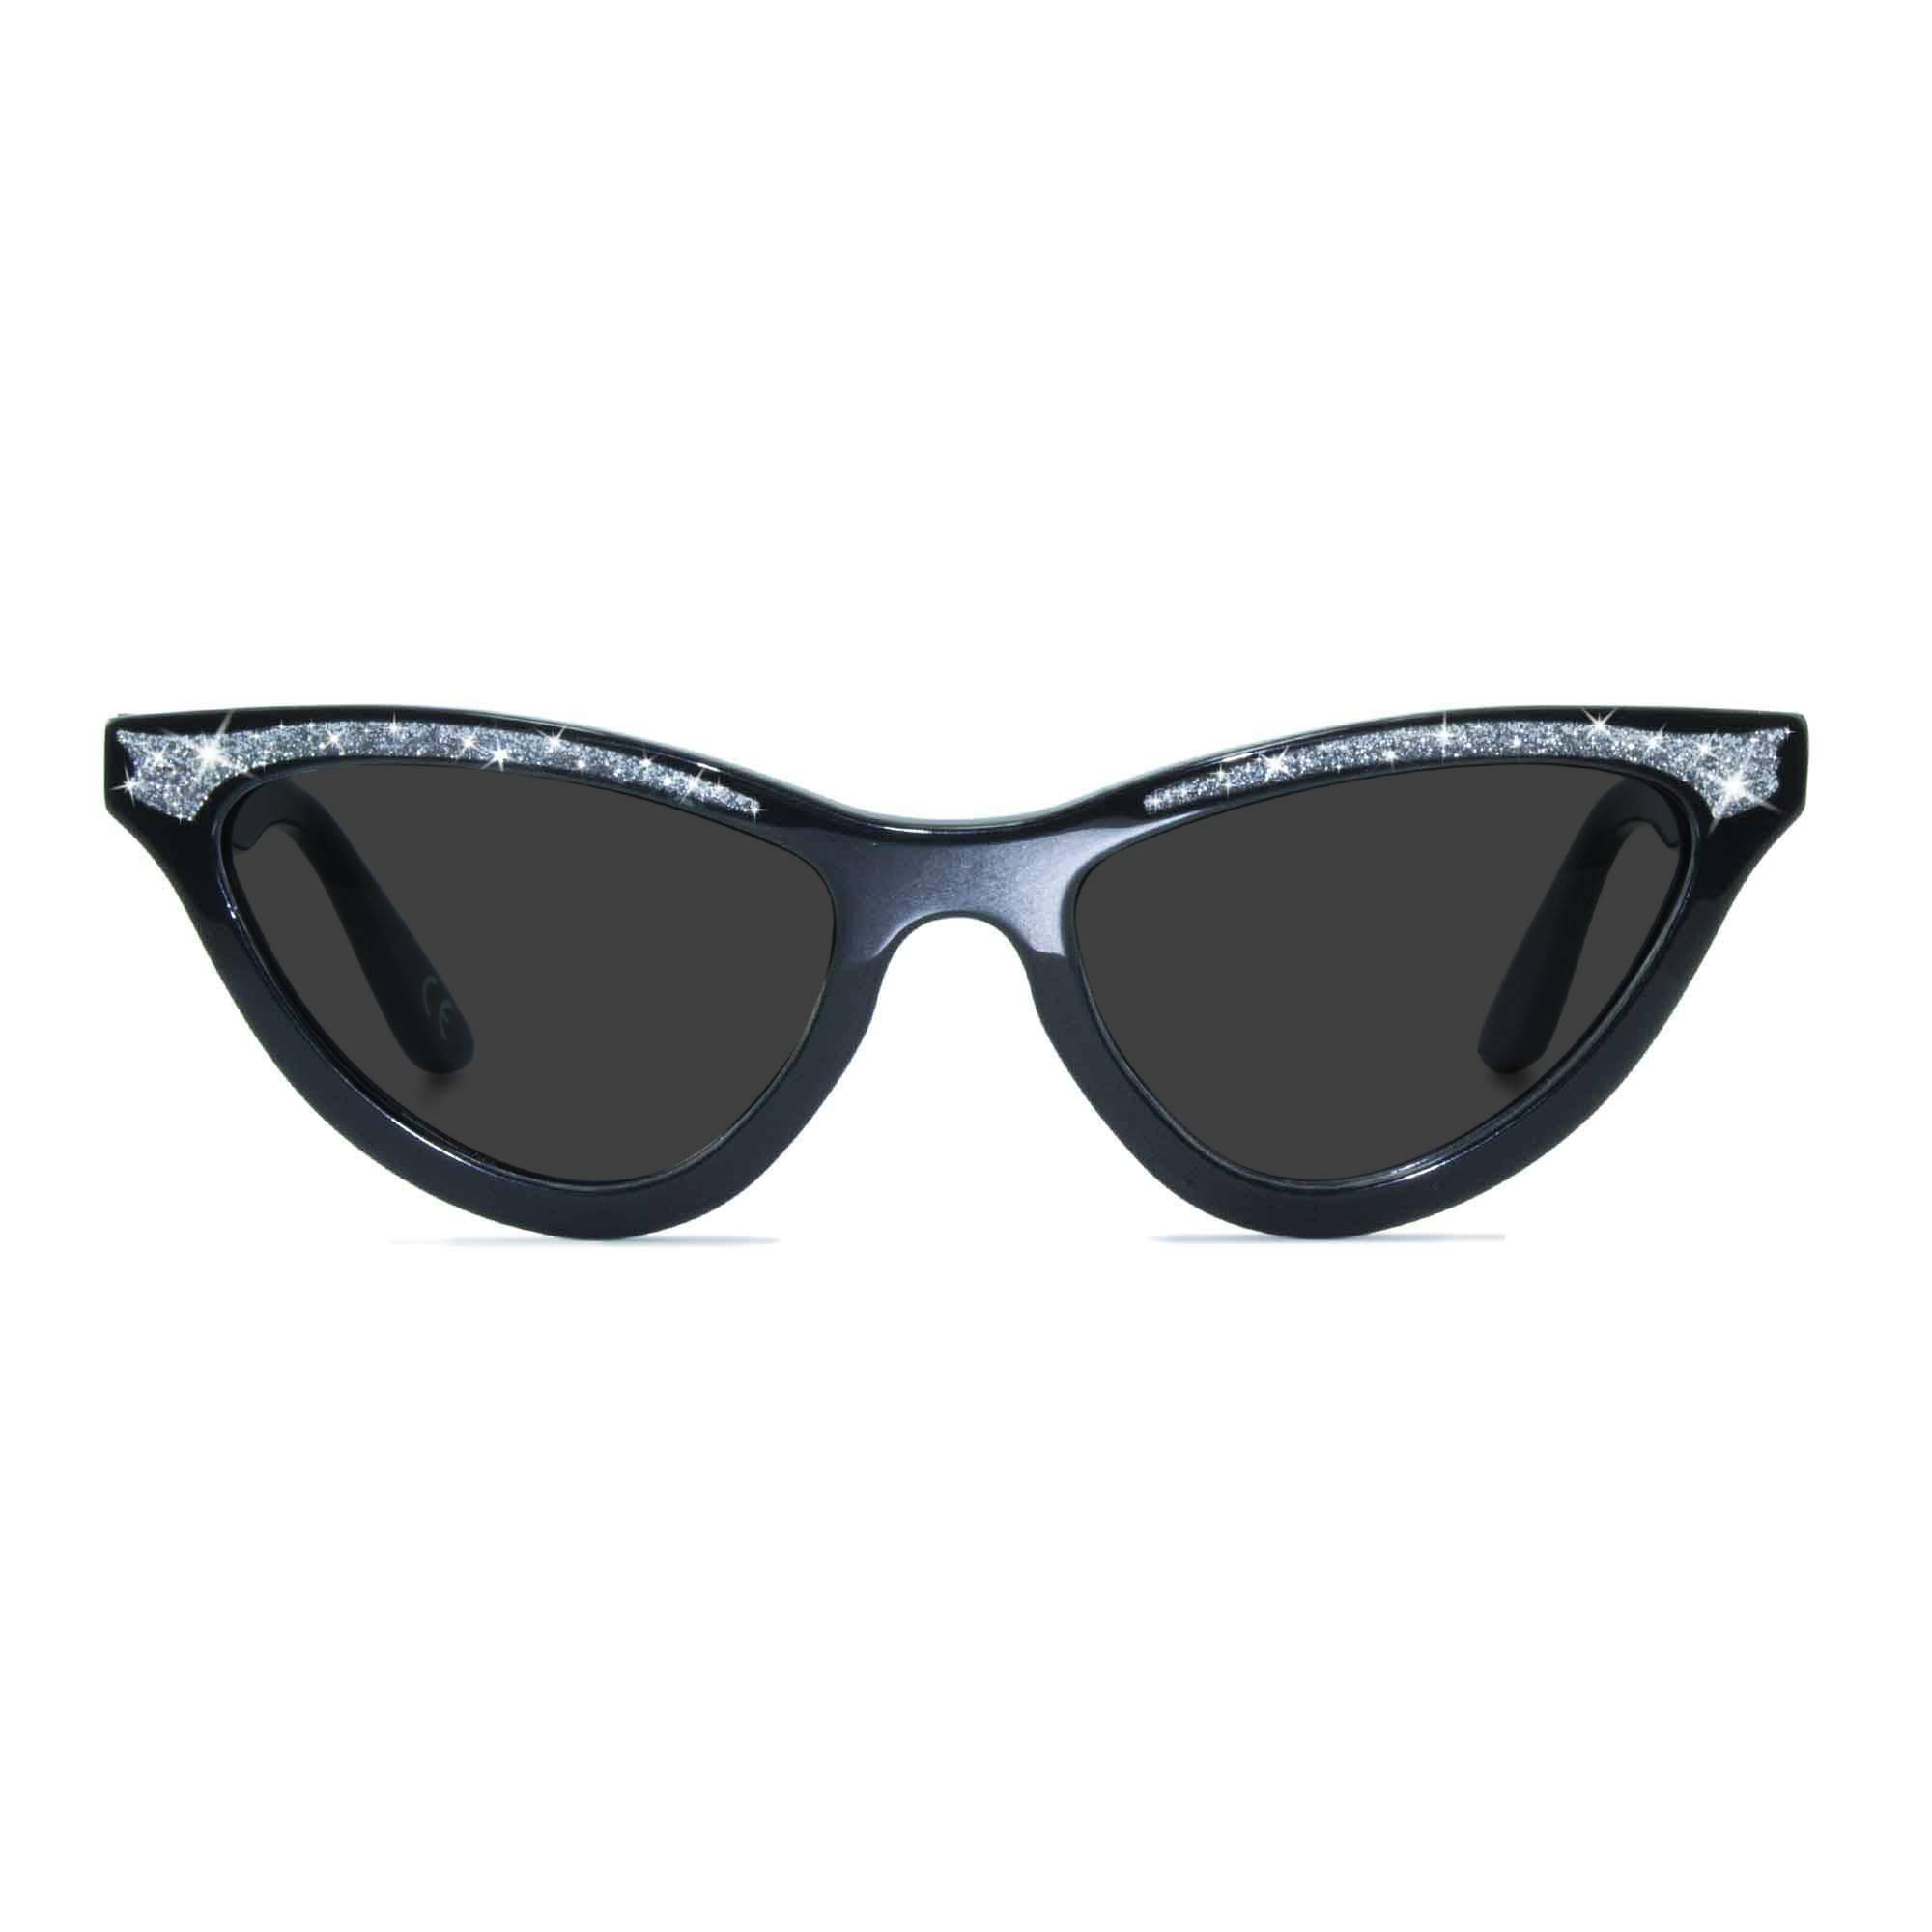 Joiuss maryloo black cat eye sunglasses